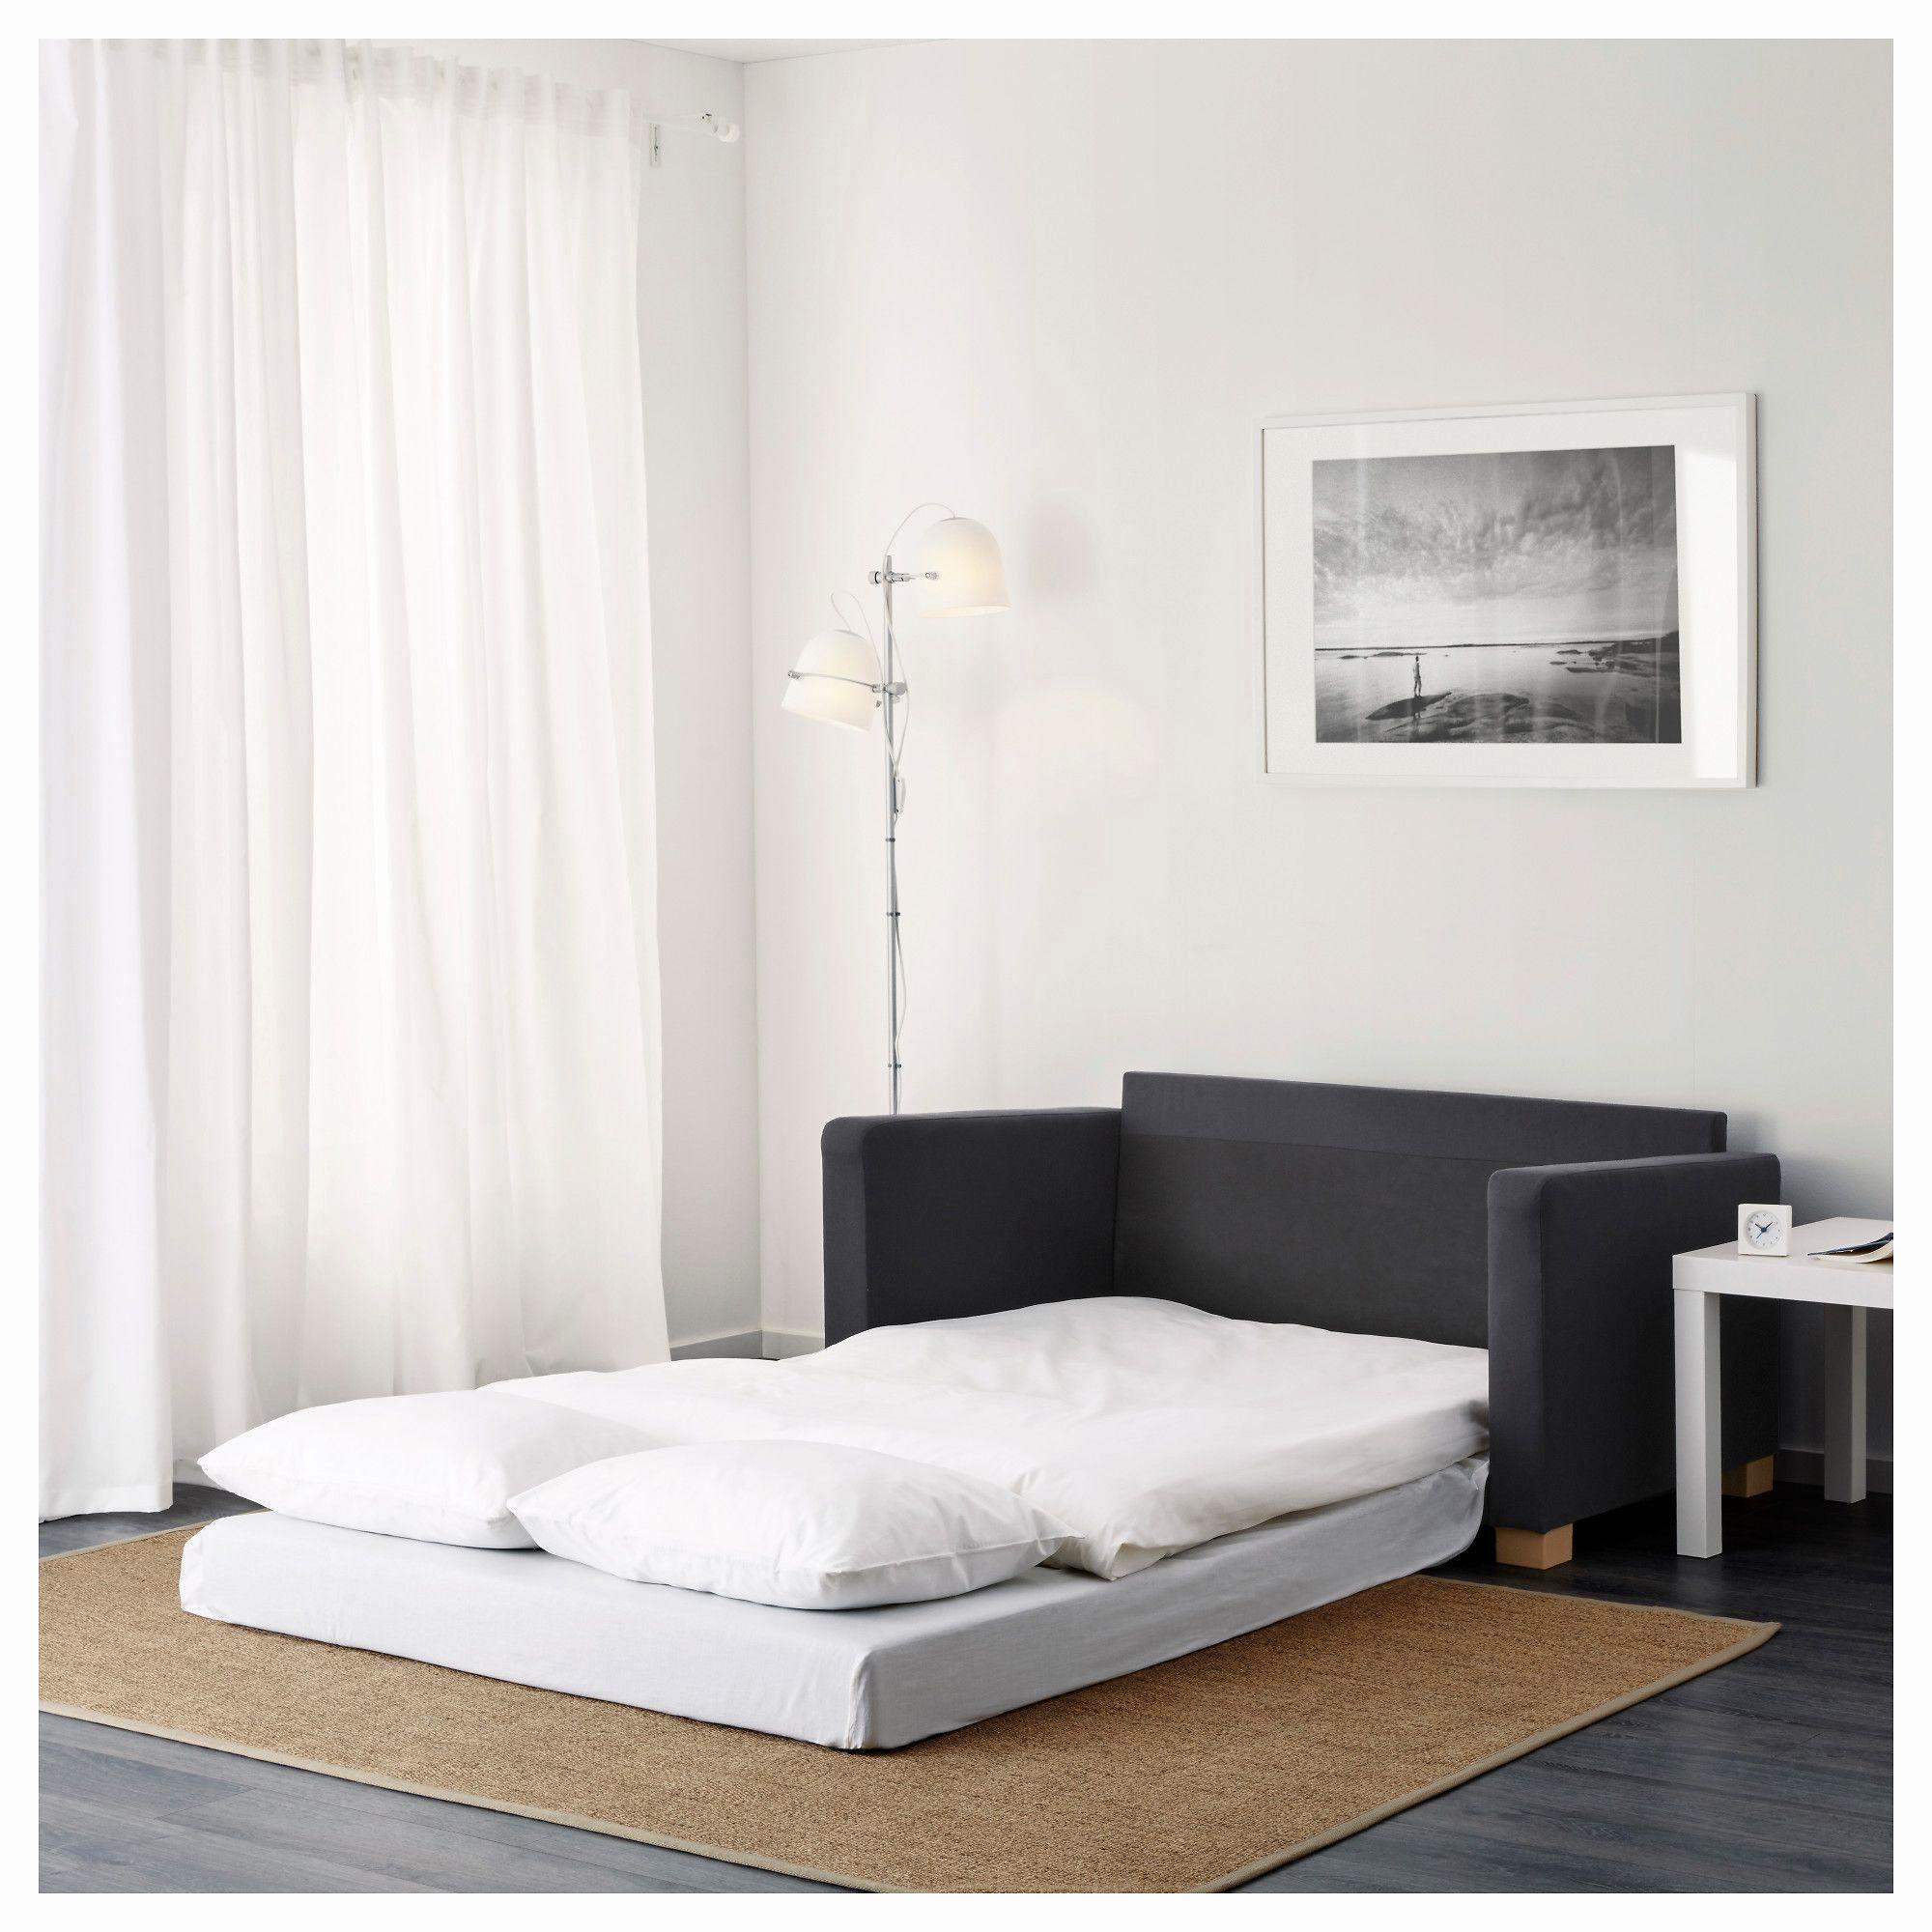 Lit Modulable Ikea Unique Banquette Lit Ikea Inspirant Interior 50 Inspirational Ikea sofa